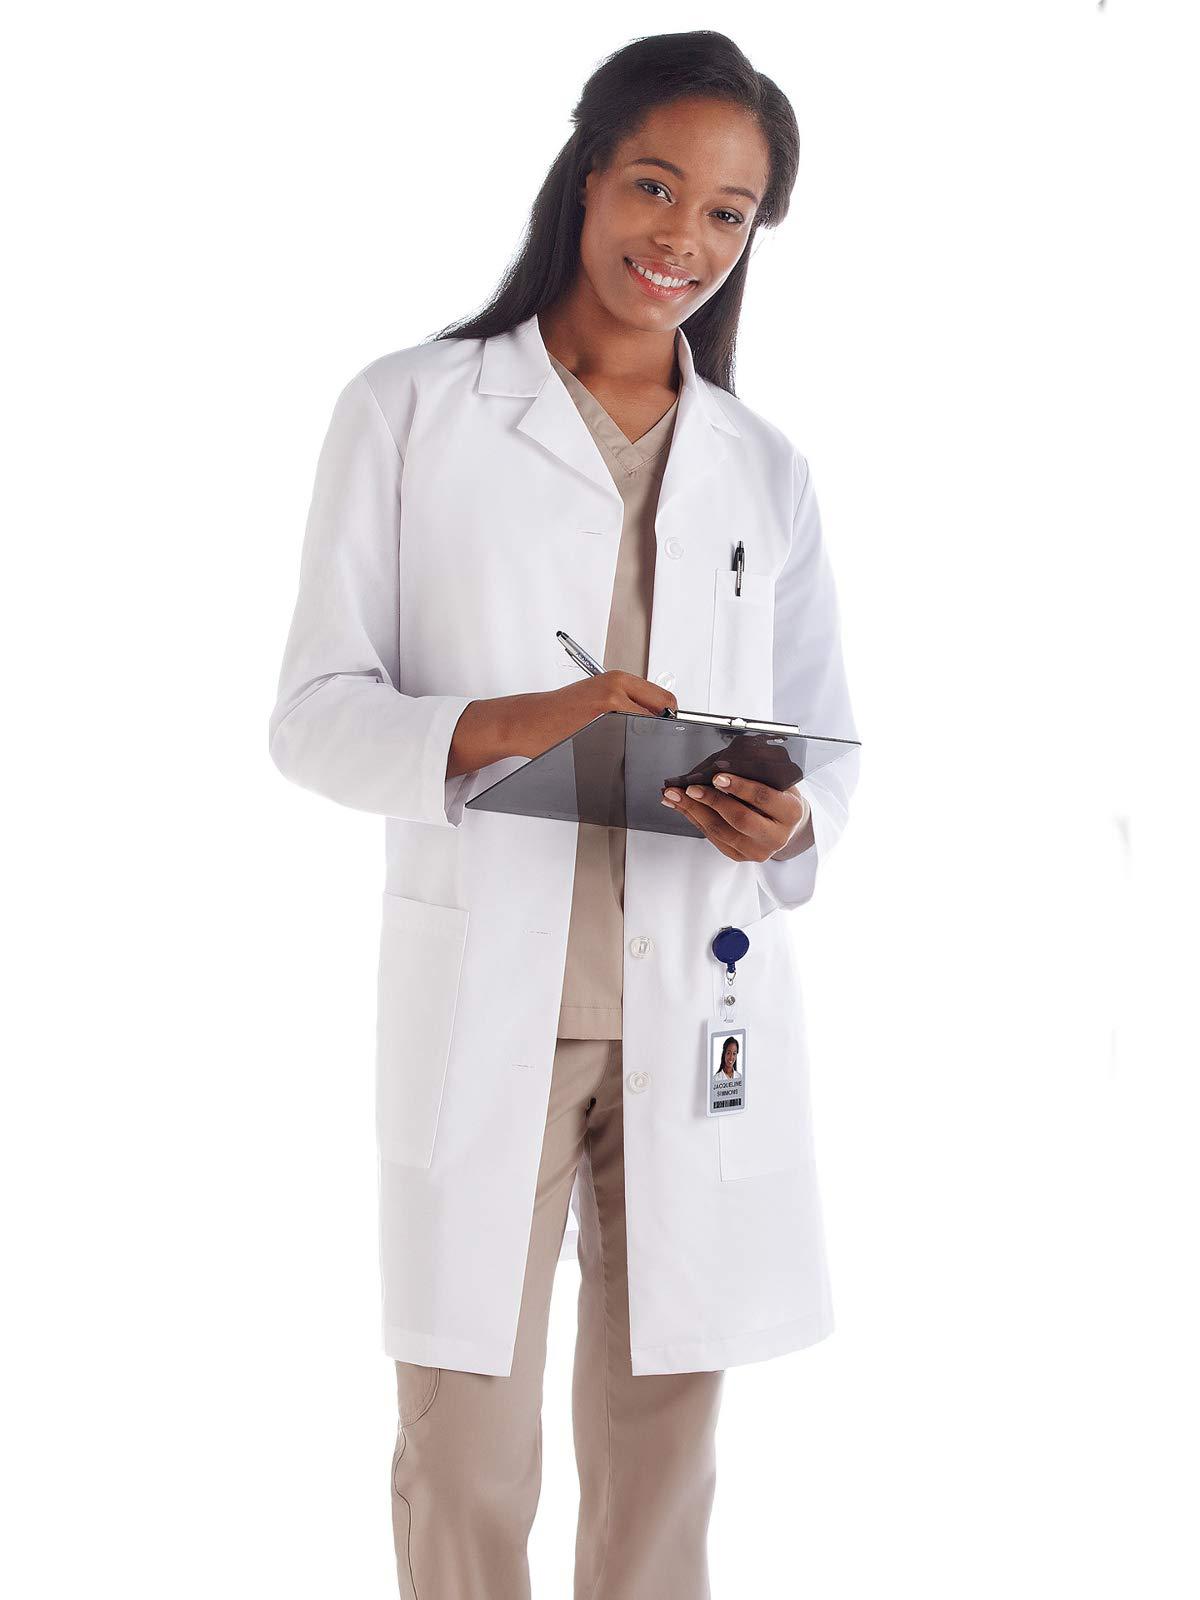 Meta Fundamentals 15113 Women's 37'' Lab Coat White 3XL